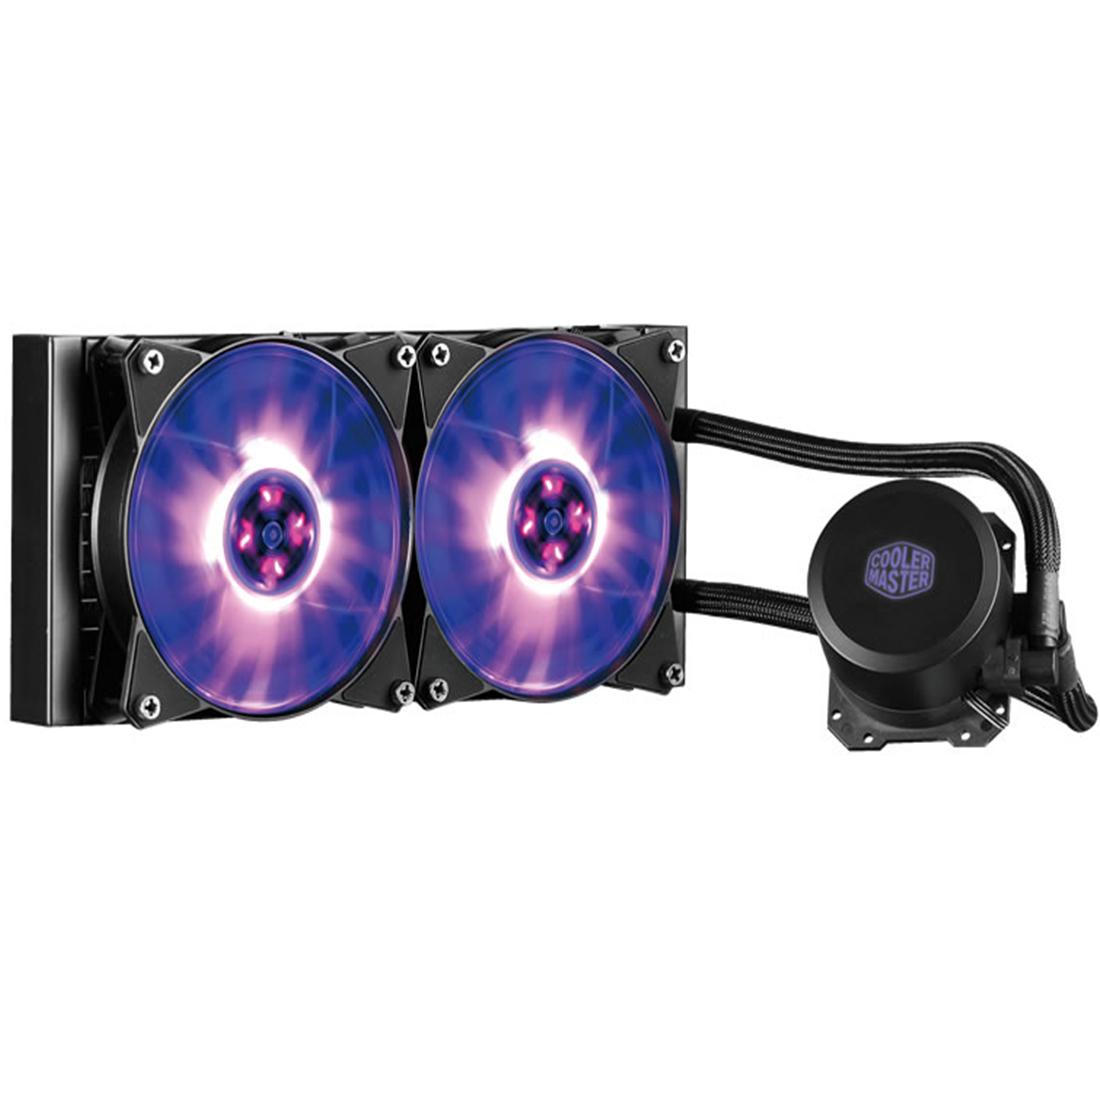 Tản nước AIO Cooler Master MasterLiquid ML240L RGB